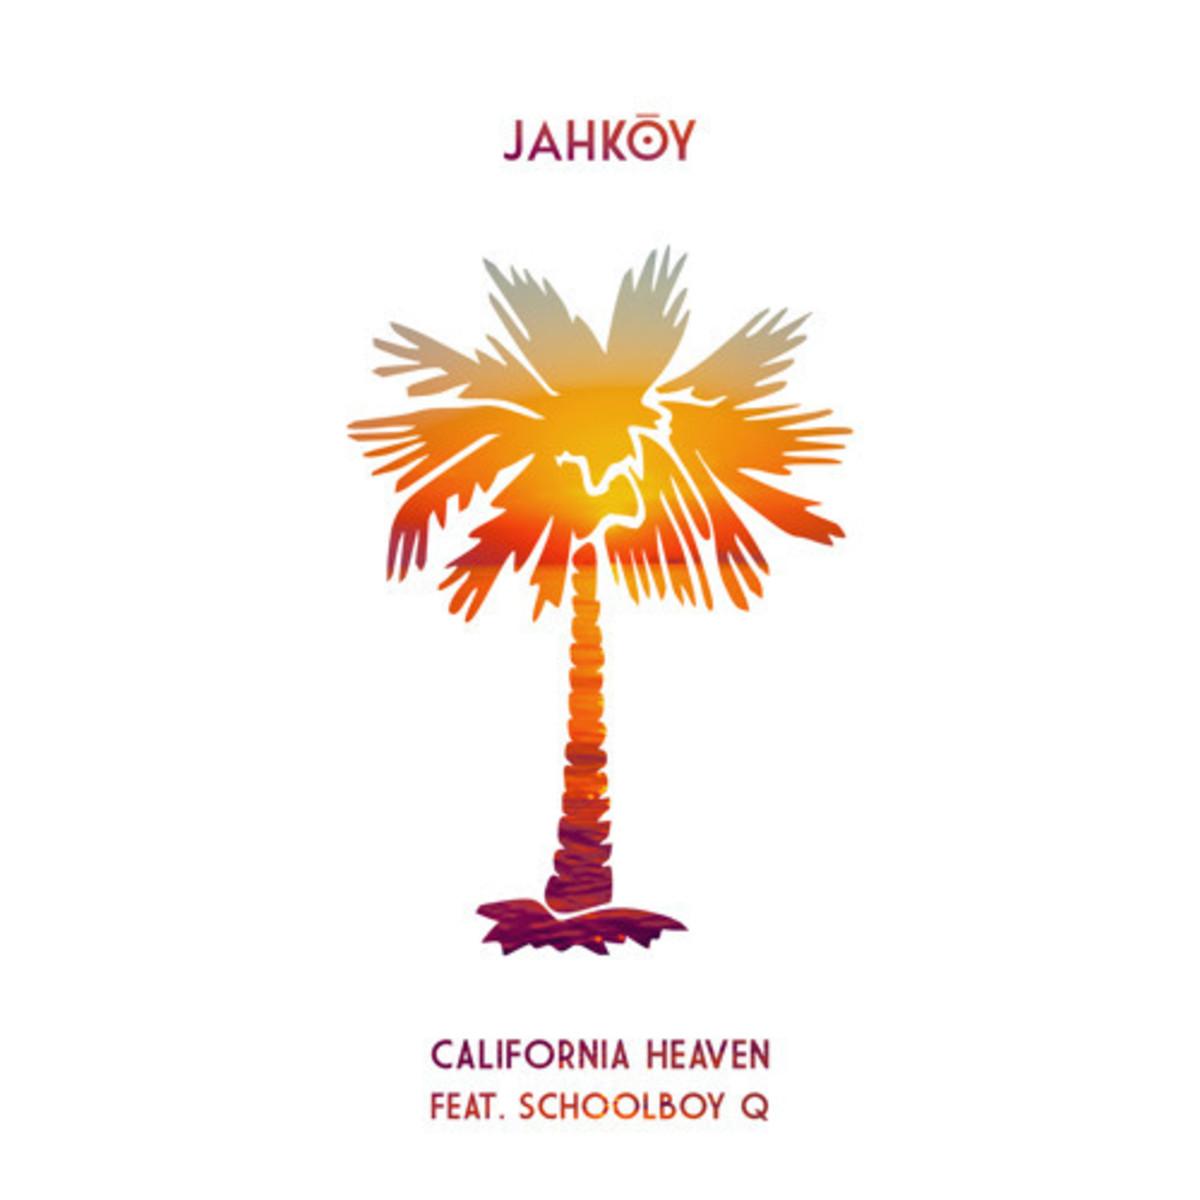 jahkoy-california-heaven.jpg